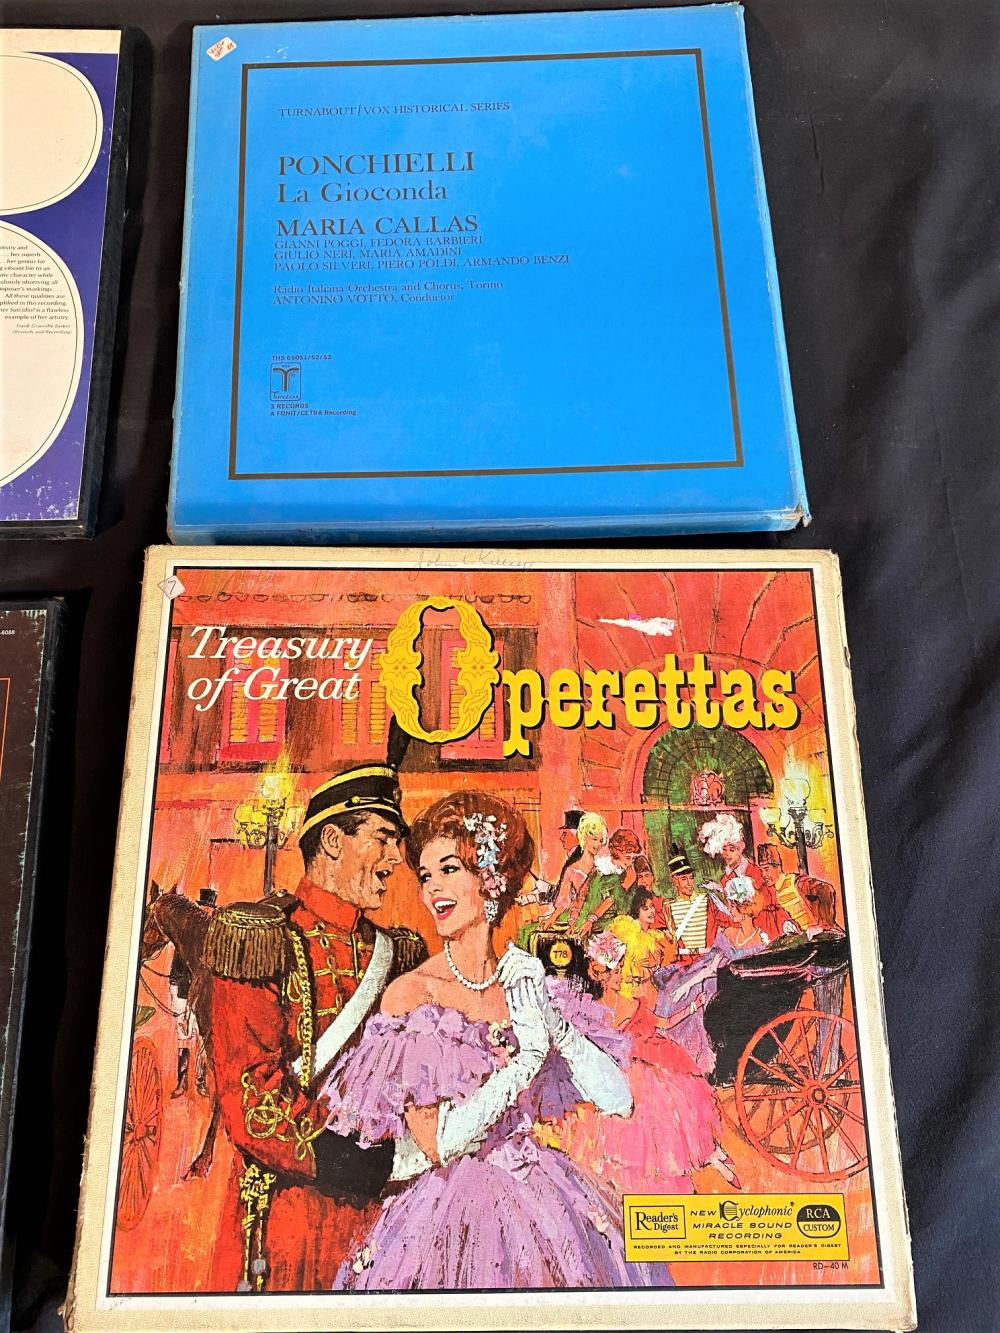 OPERA VINYL RECORD COLLECTION - 10 BOX SETS